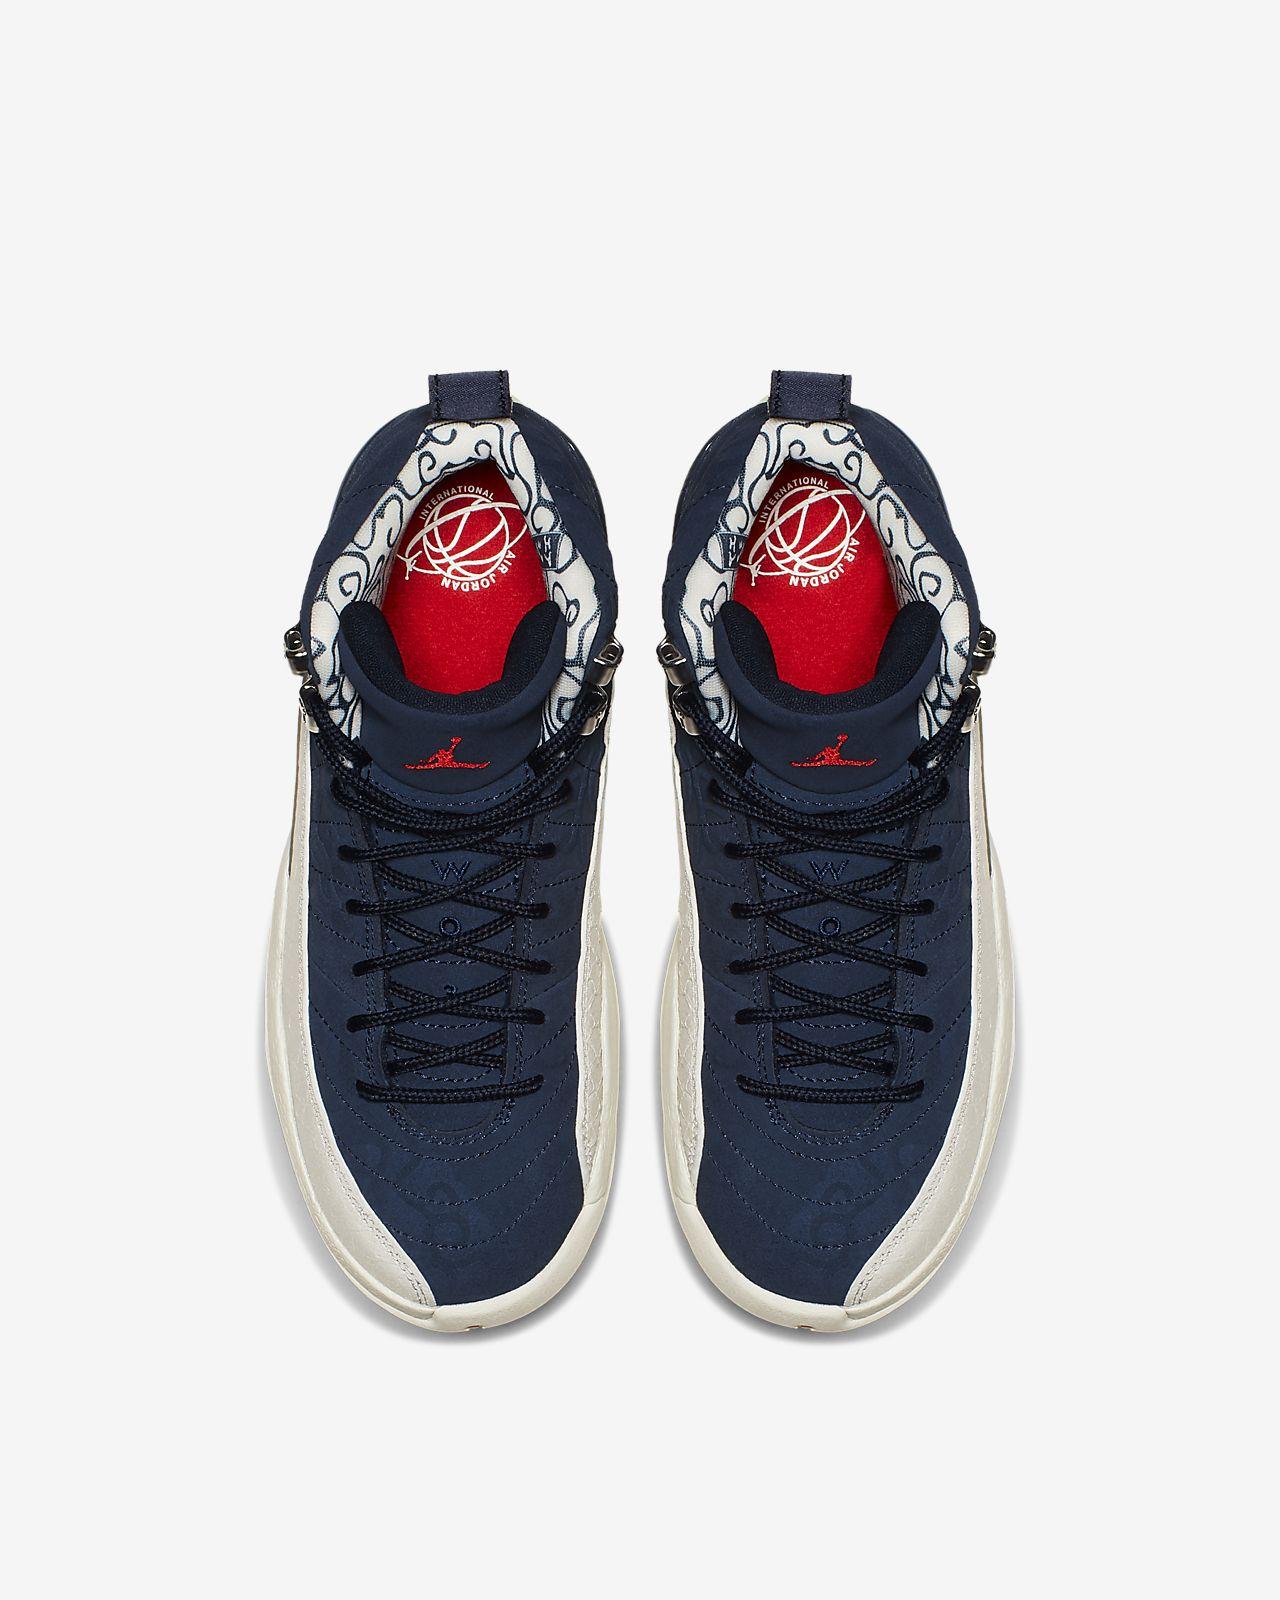 8c780d5e8c6e Air Jordan 12 Retro Premium Older Kids  Shoe. Nike.com IN